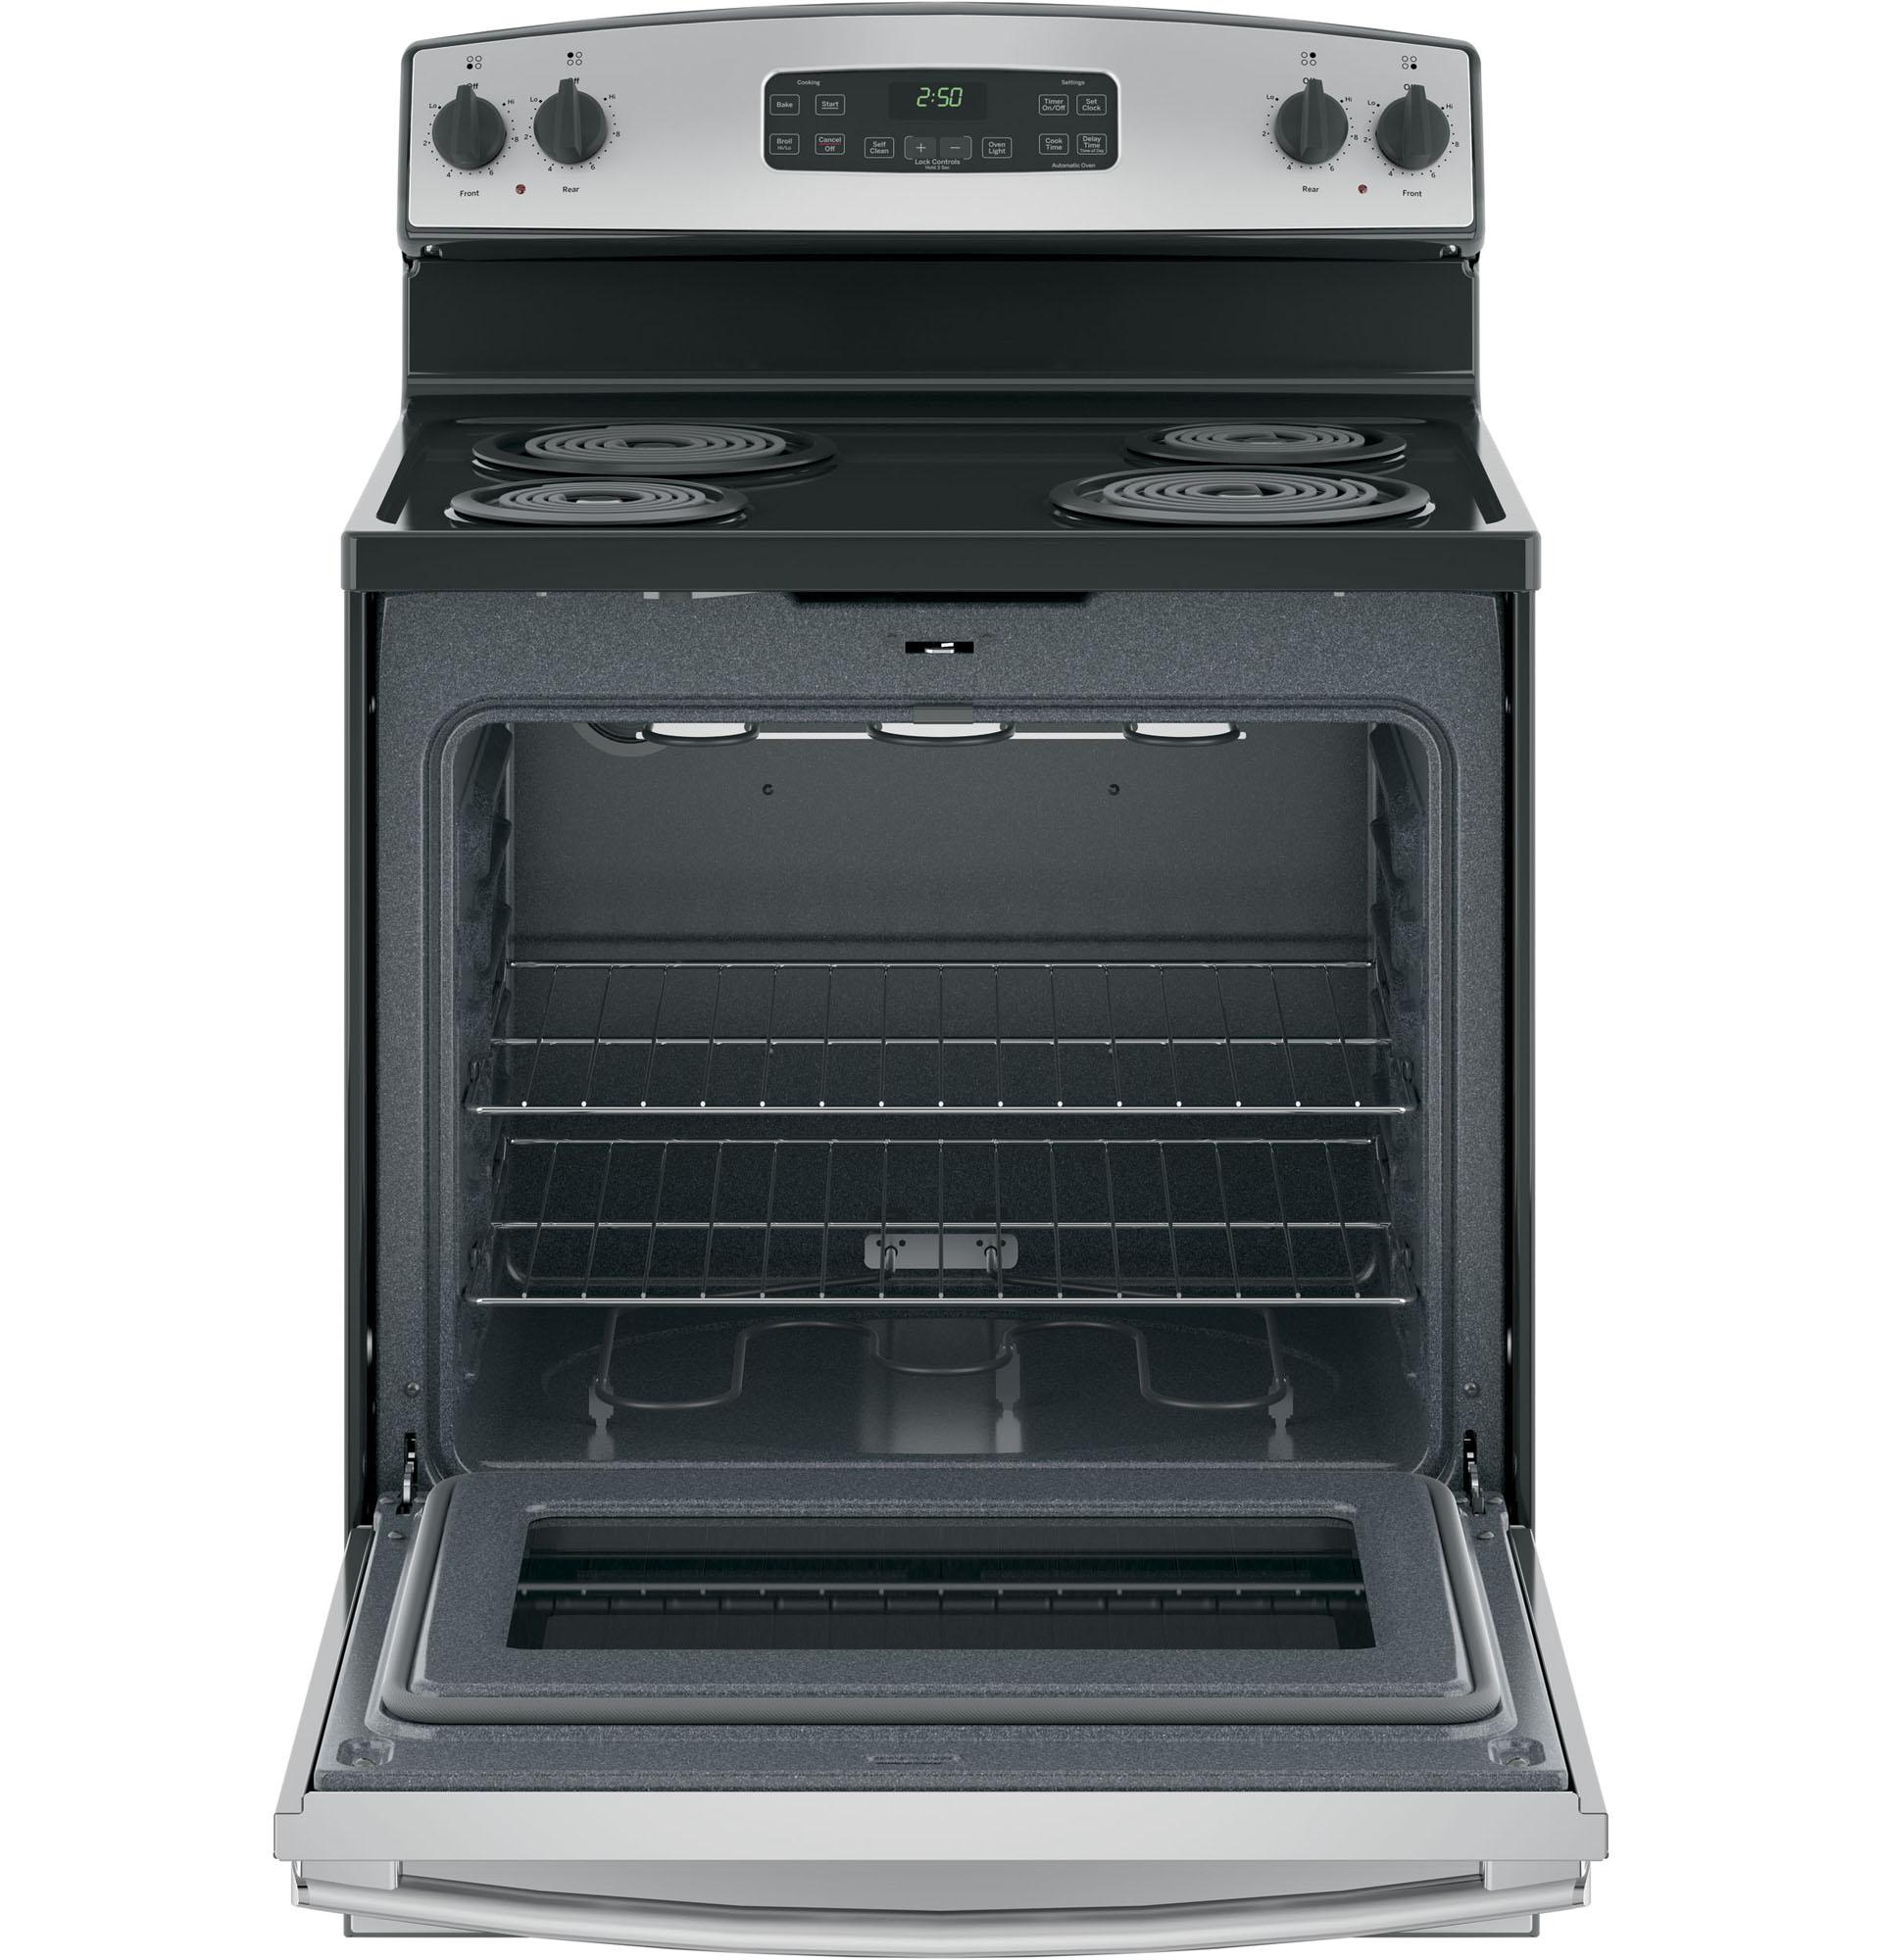 "GE Appliances JB250RKSS 30"" Freestanding Electric Range - Stainless Steel"